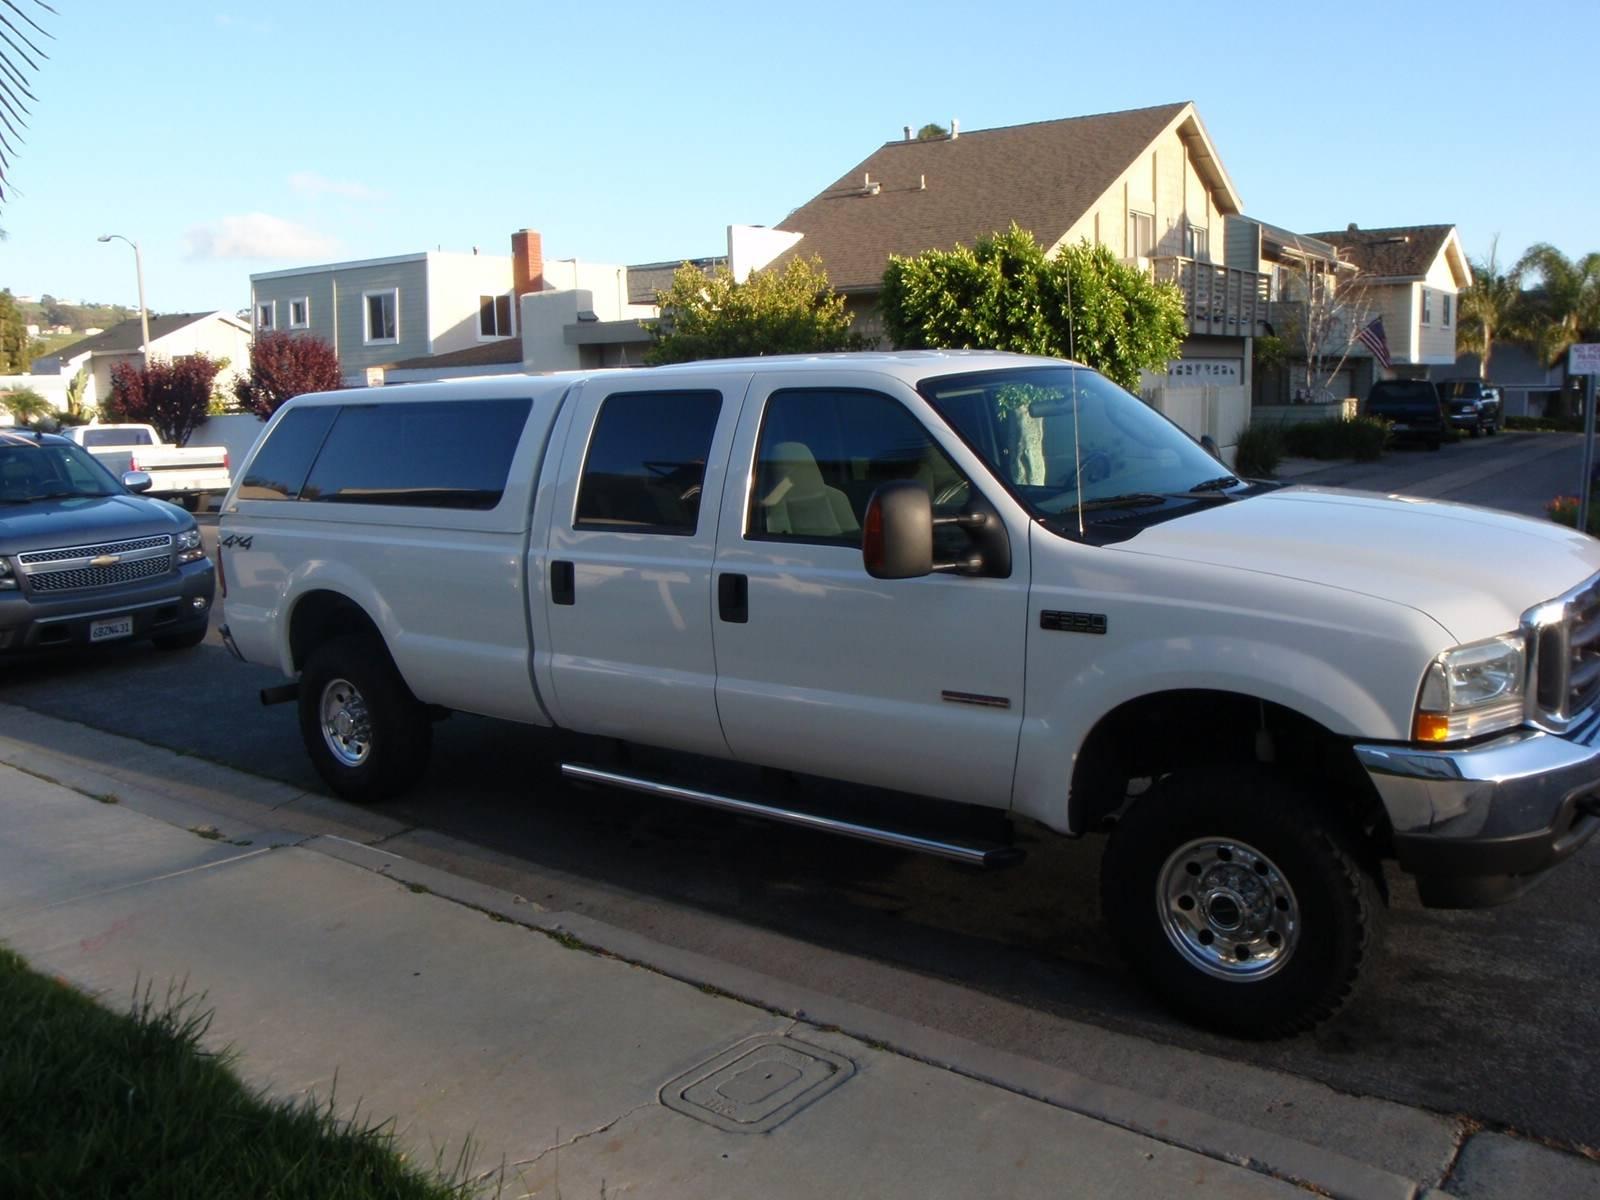 2004 ford f 350 crew cab long bed 4x4 diesel bloodydecks. Black Bedroom Furniture Sets. Home Design Ideas